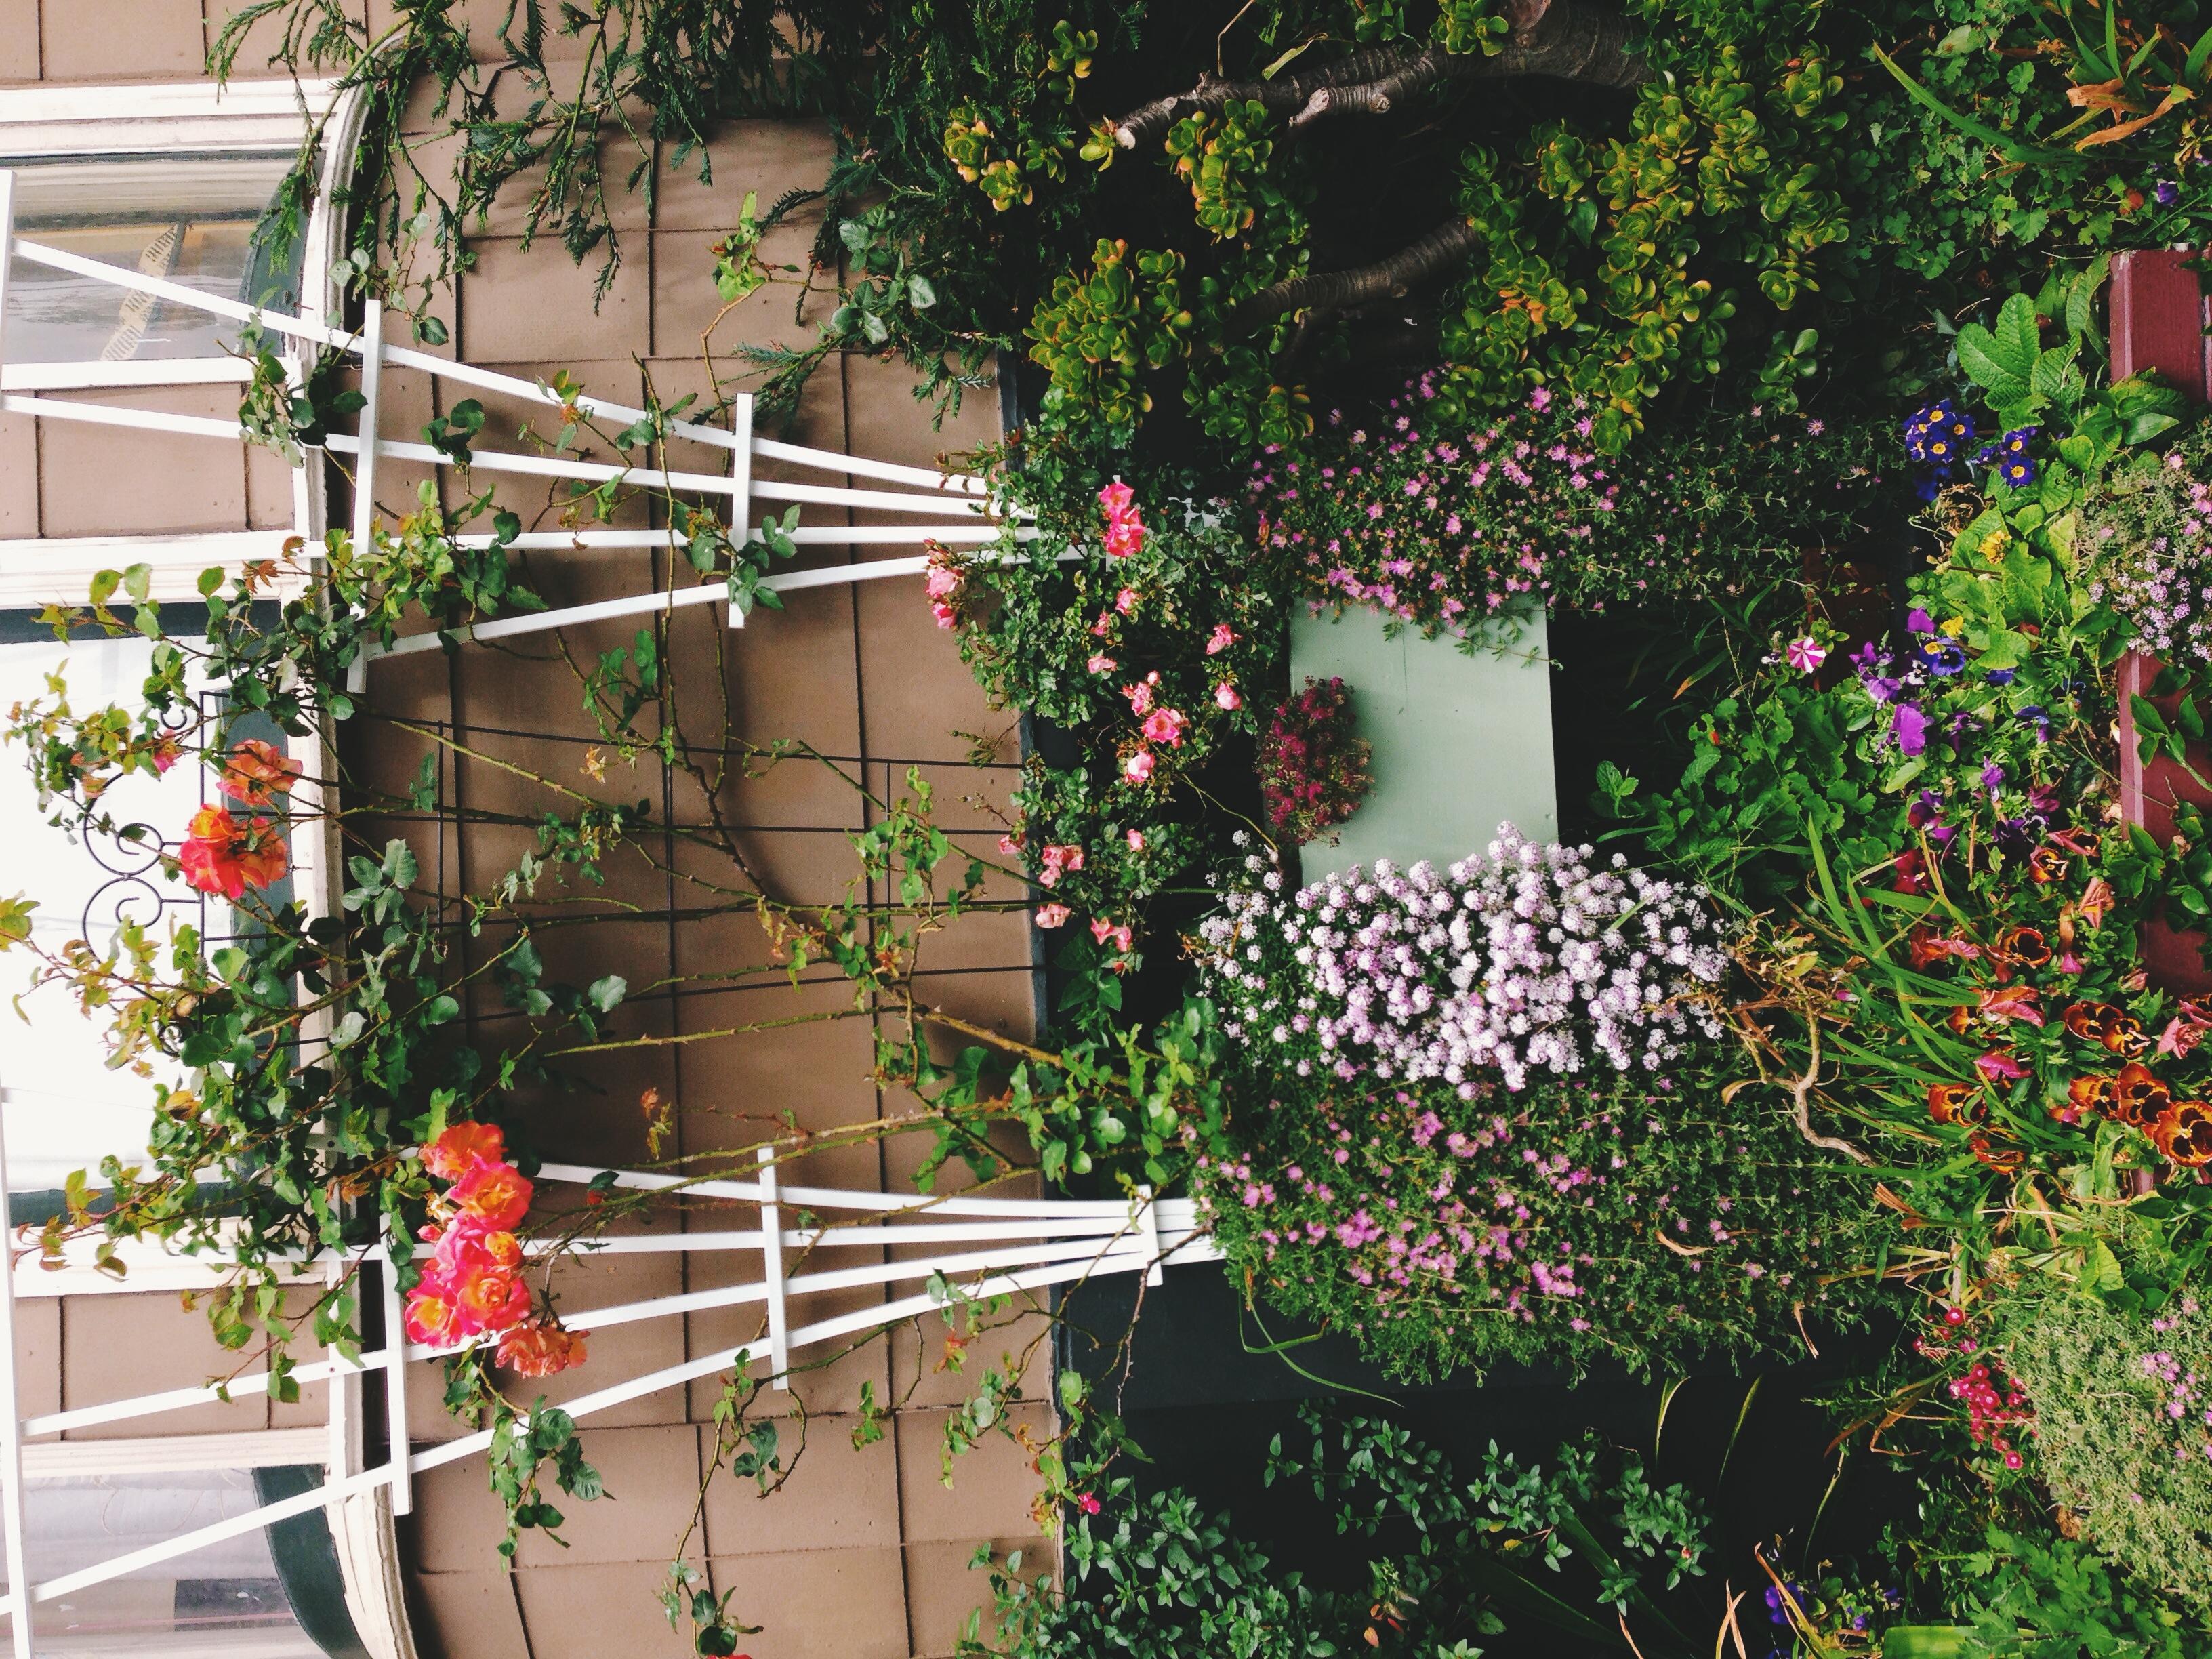 A beautiful homefront garden near Alamo Square